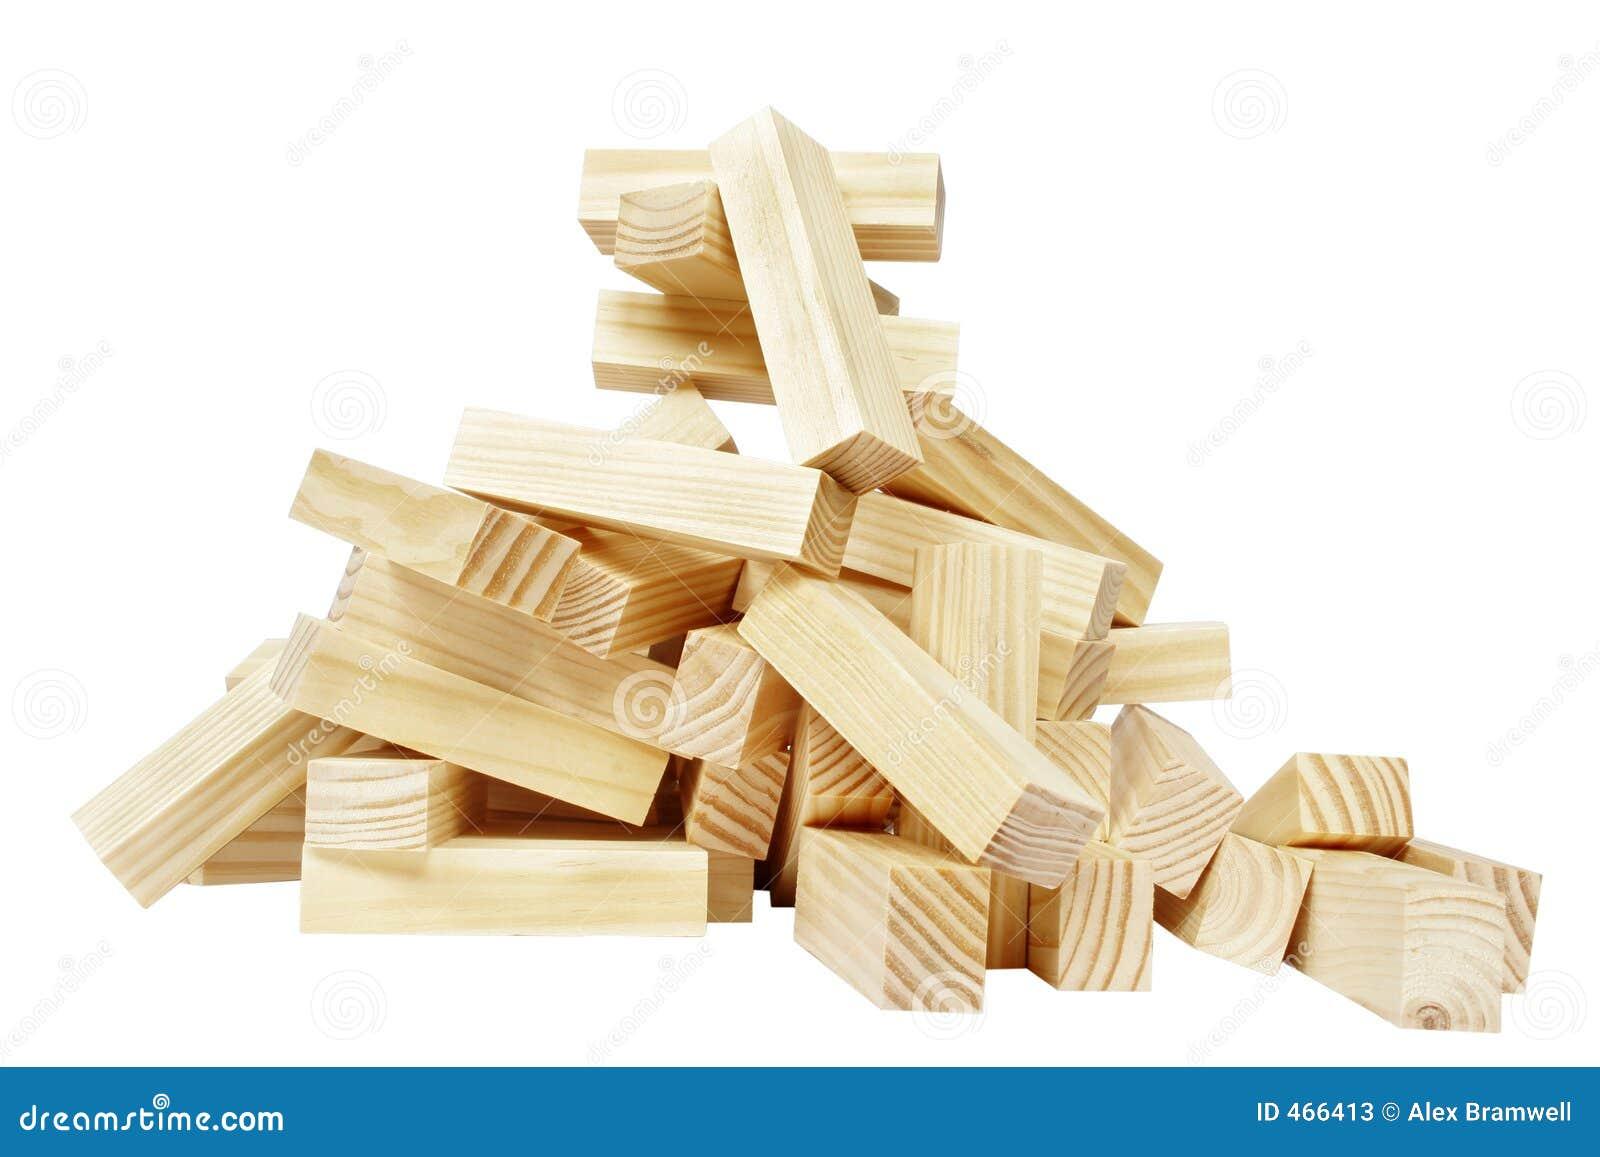 Wood Block Clip Art ~ Wood block pile stock photos image